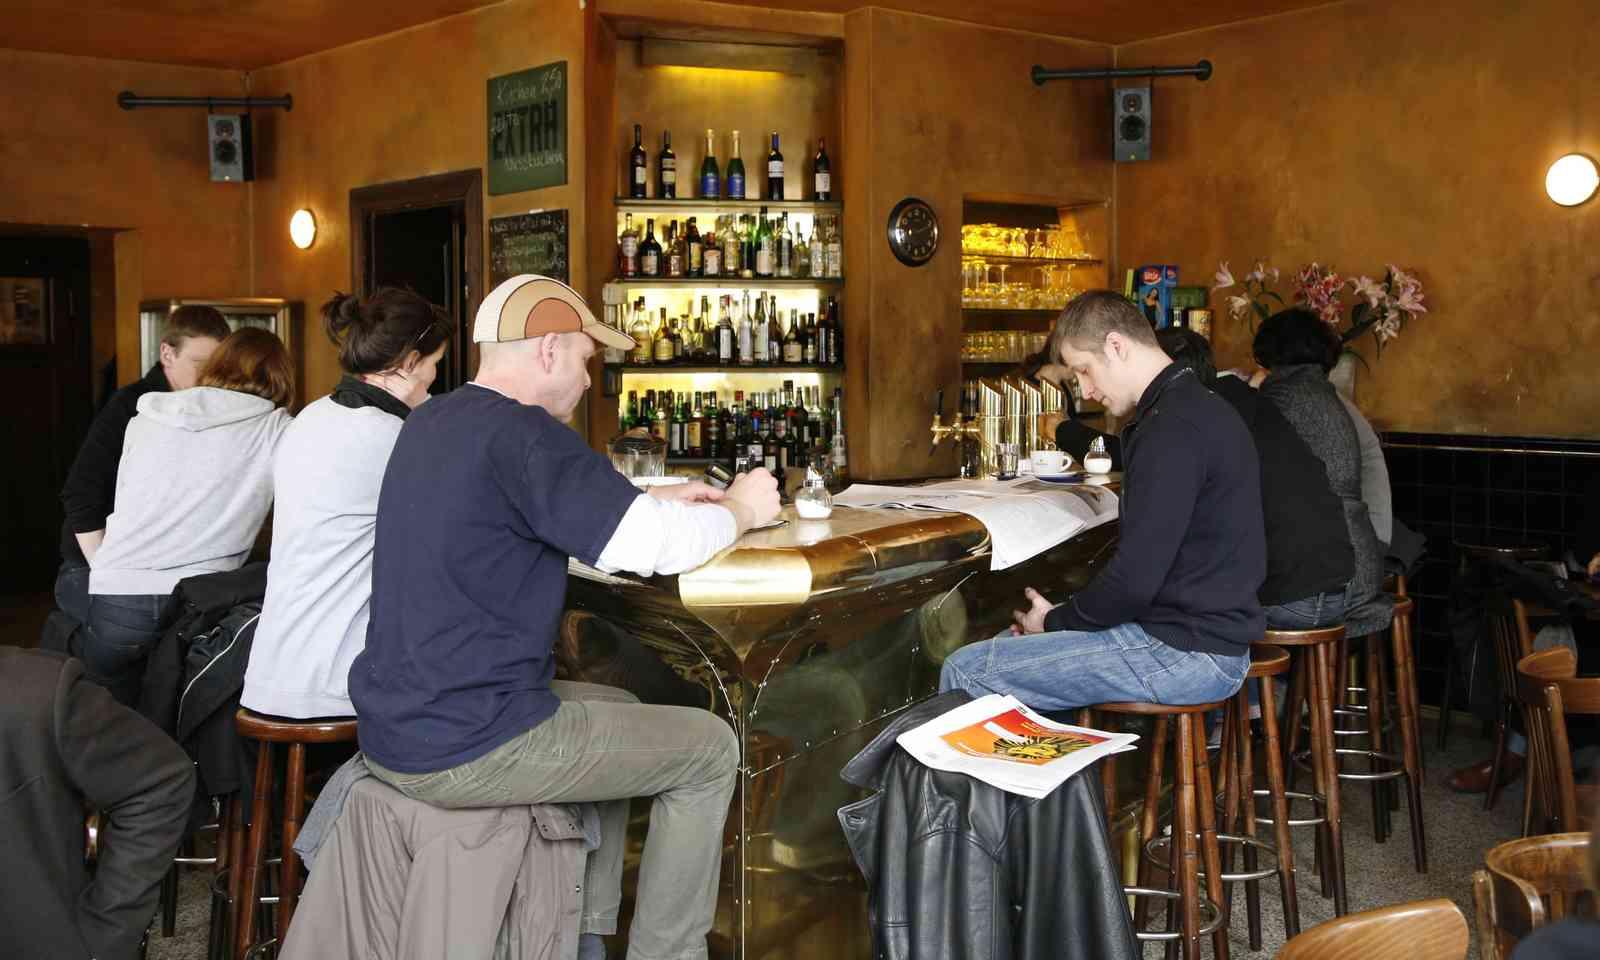 Café Life in Berlin (Shutterstock.com)